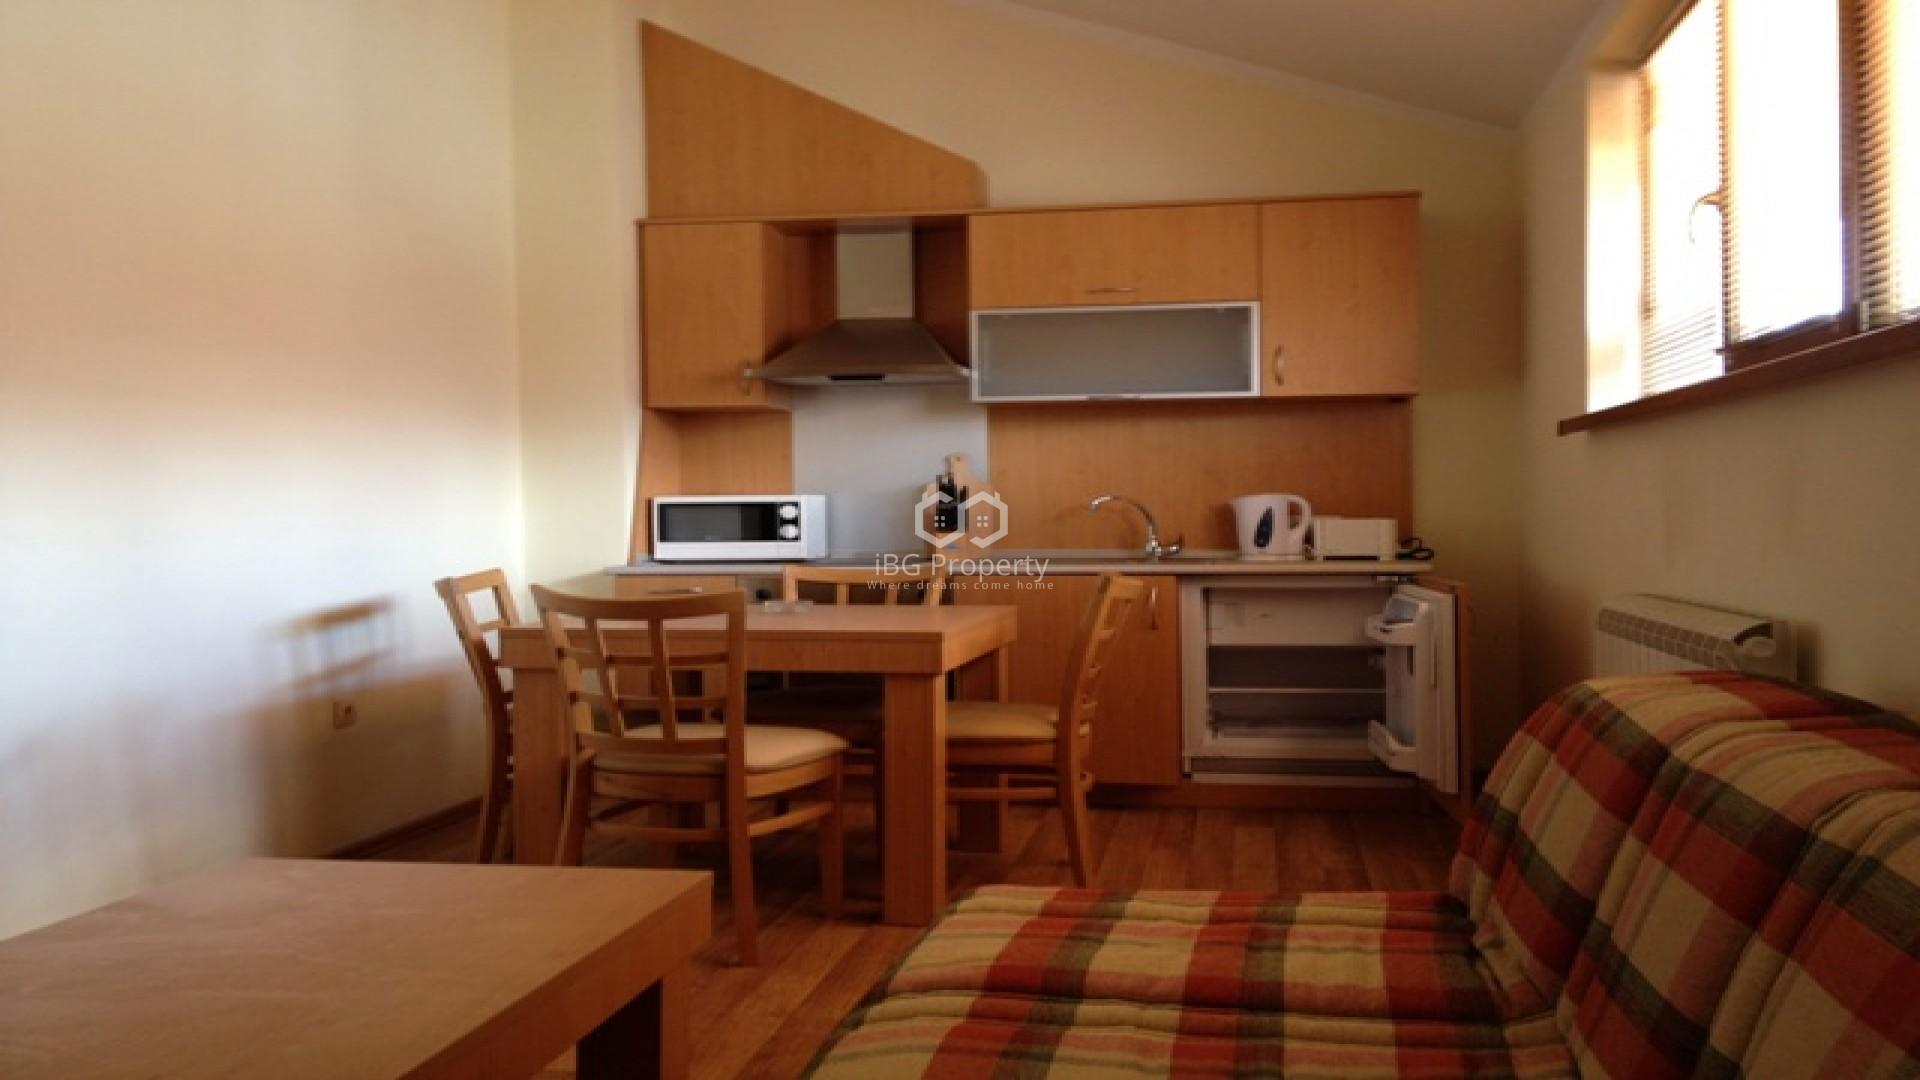 Двухкомнатная квартира Банско 63 m2